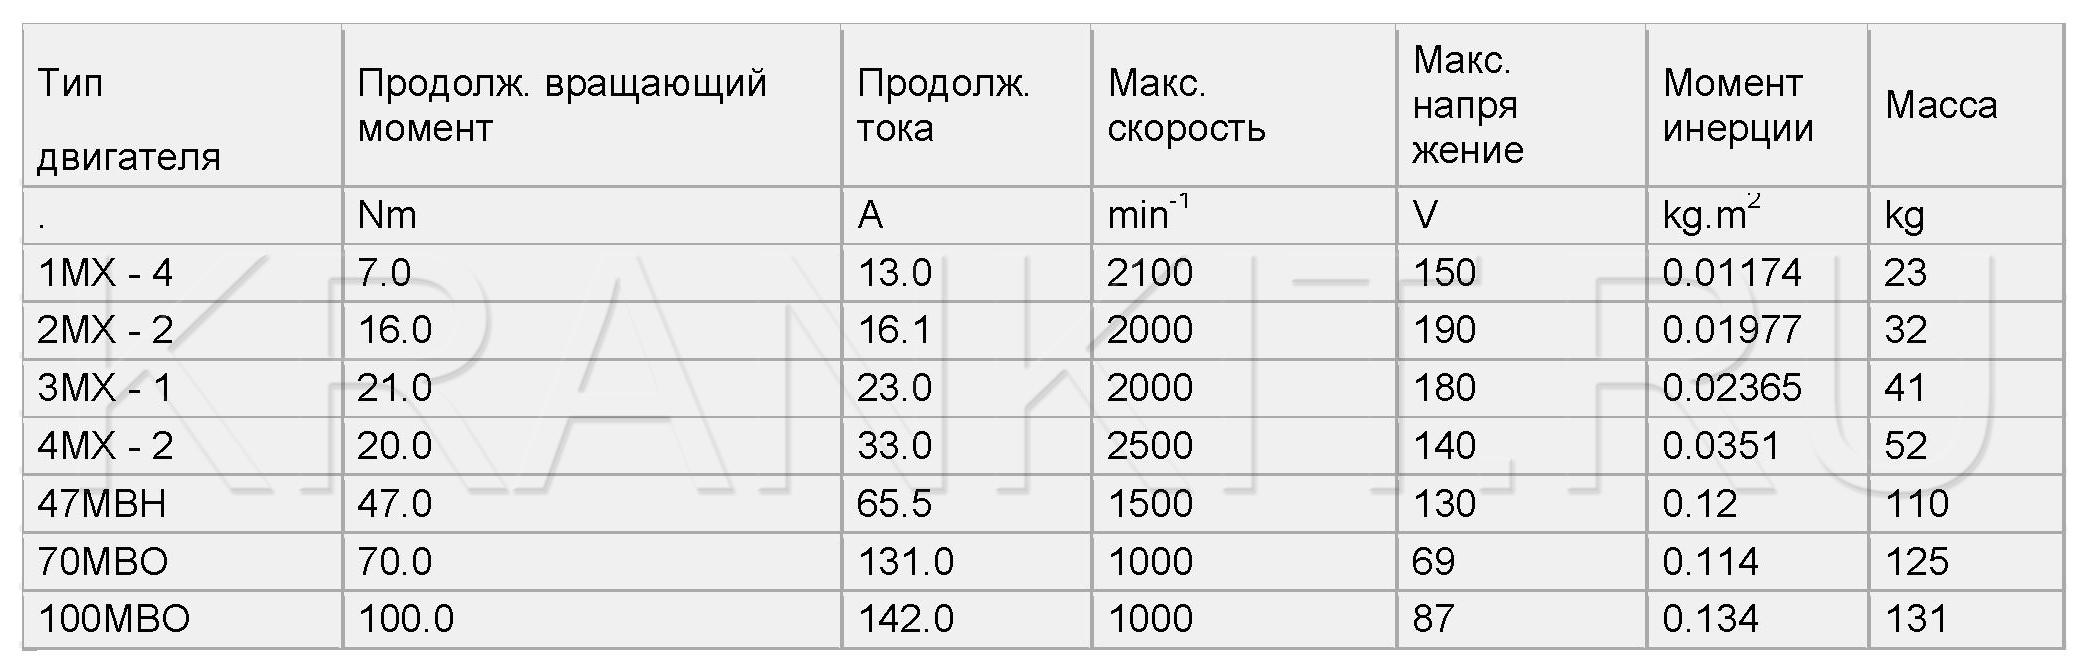 ПОСТОЯННОТОКОВЫЕ СЕРВОДВИГАТЕЛИ СЕРИИ MX, 47MBH, MBO